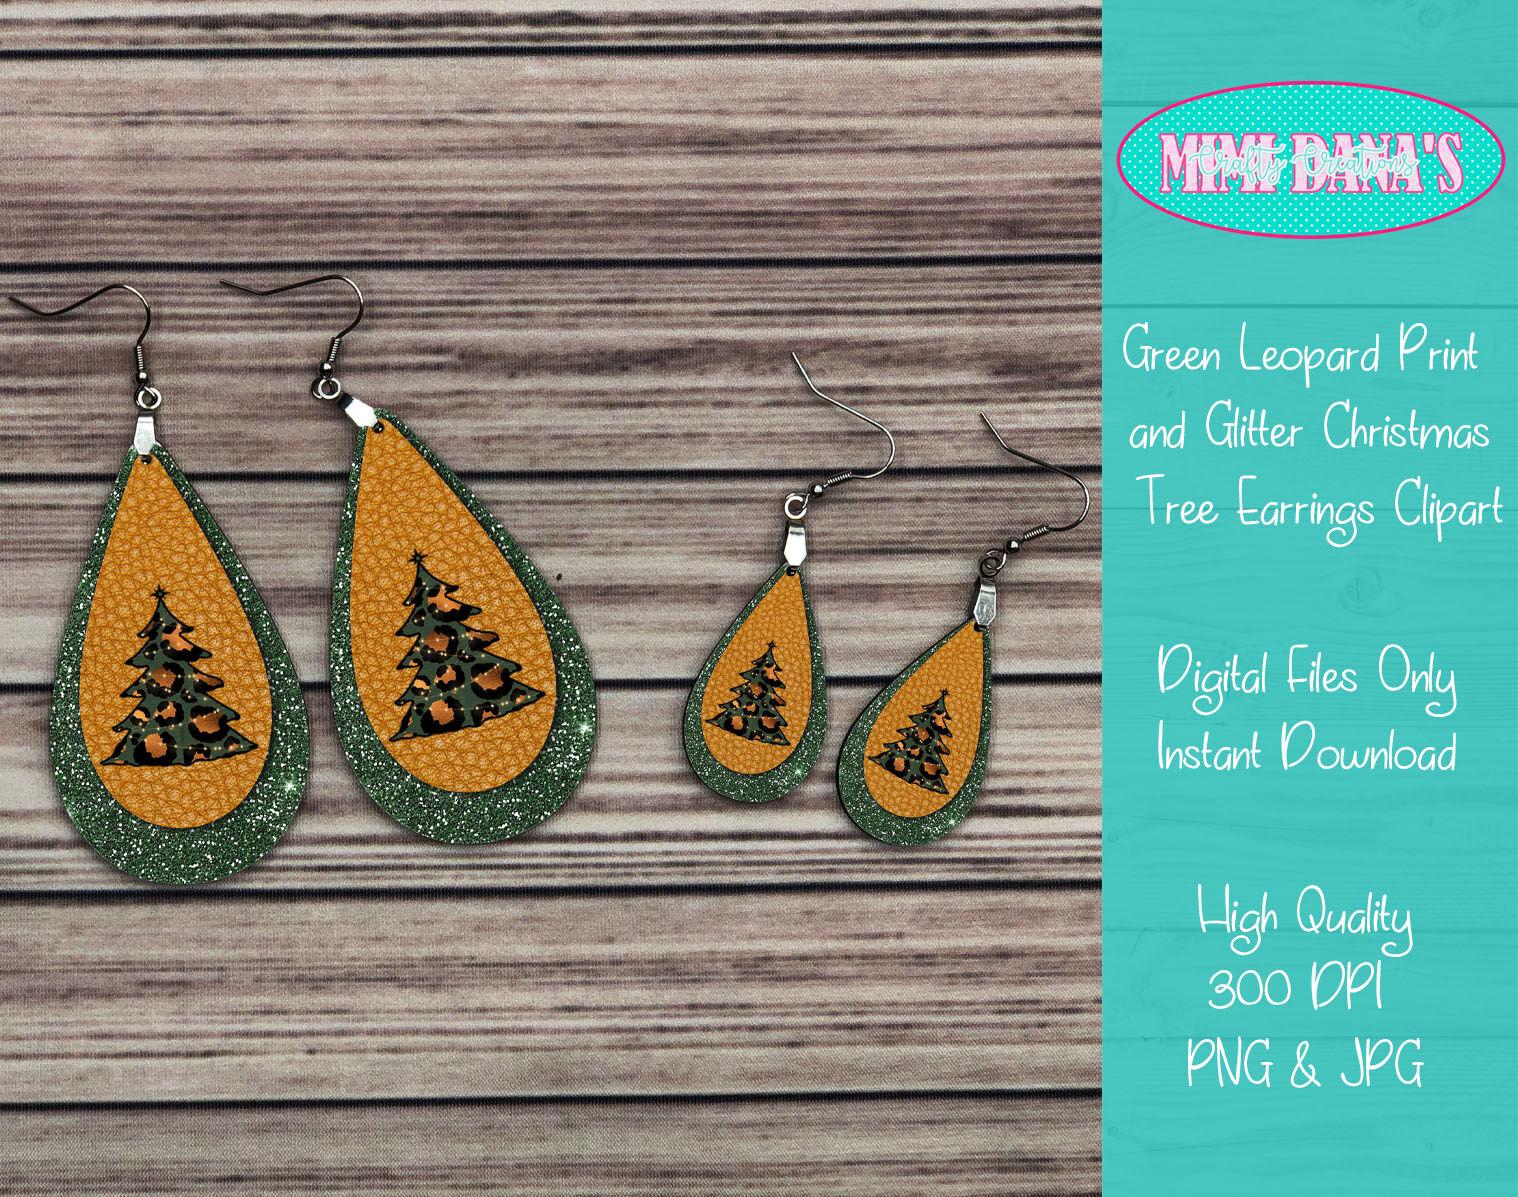 Green Leopard Print and Glitter Christmas Tree Earrings ...